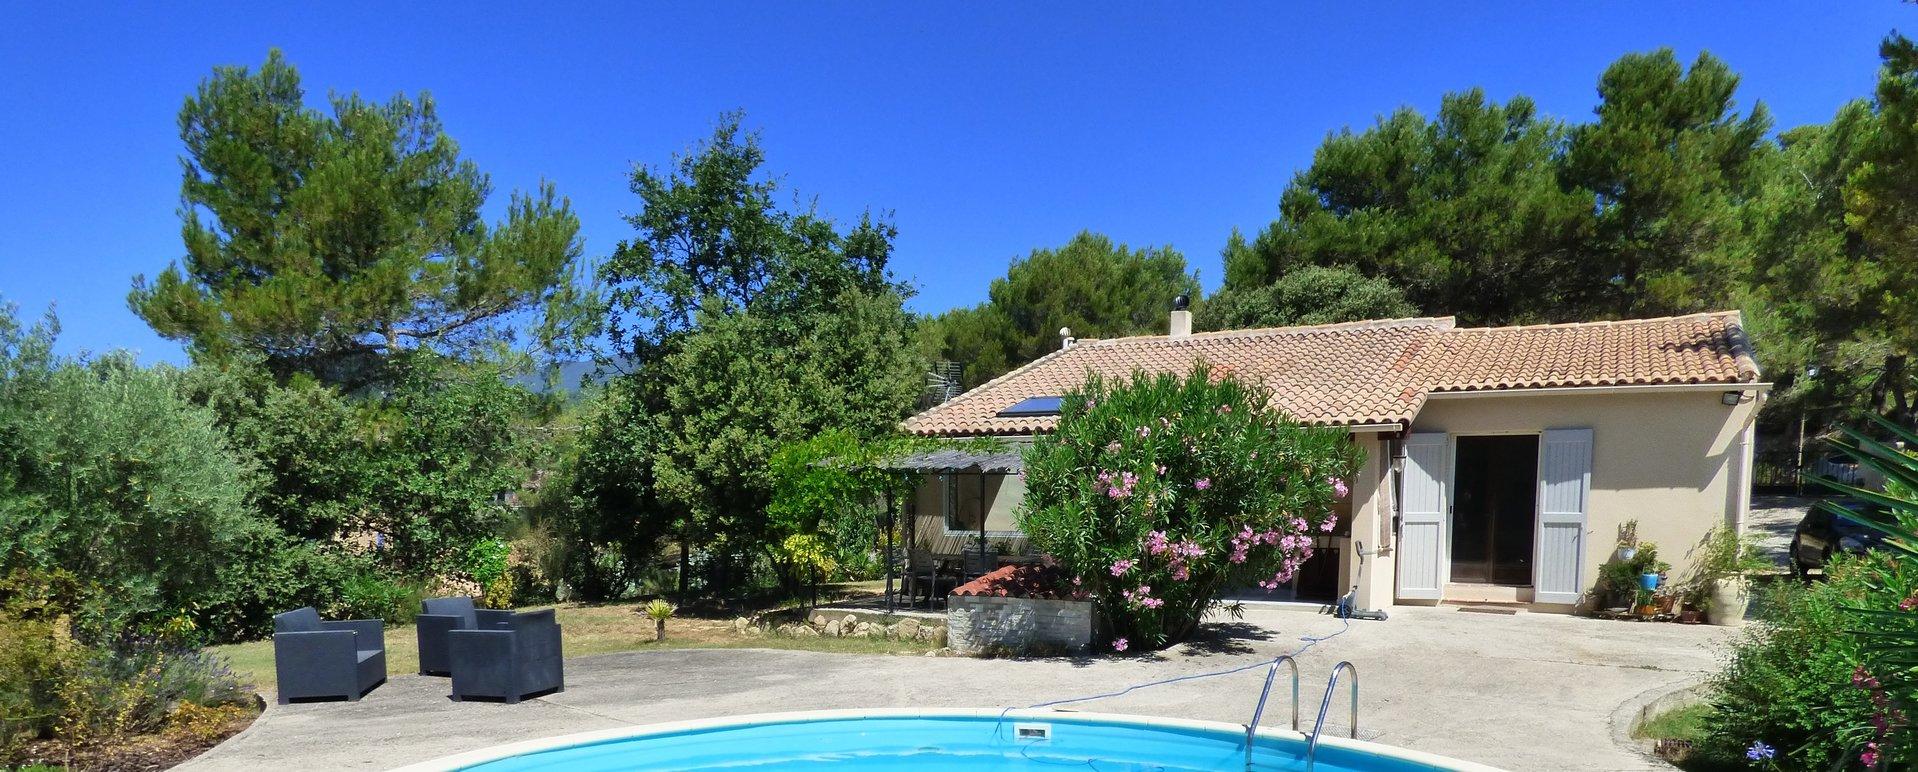 Villa plain-pied de 3 chambres, Luberon !!